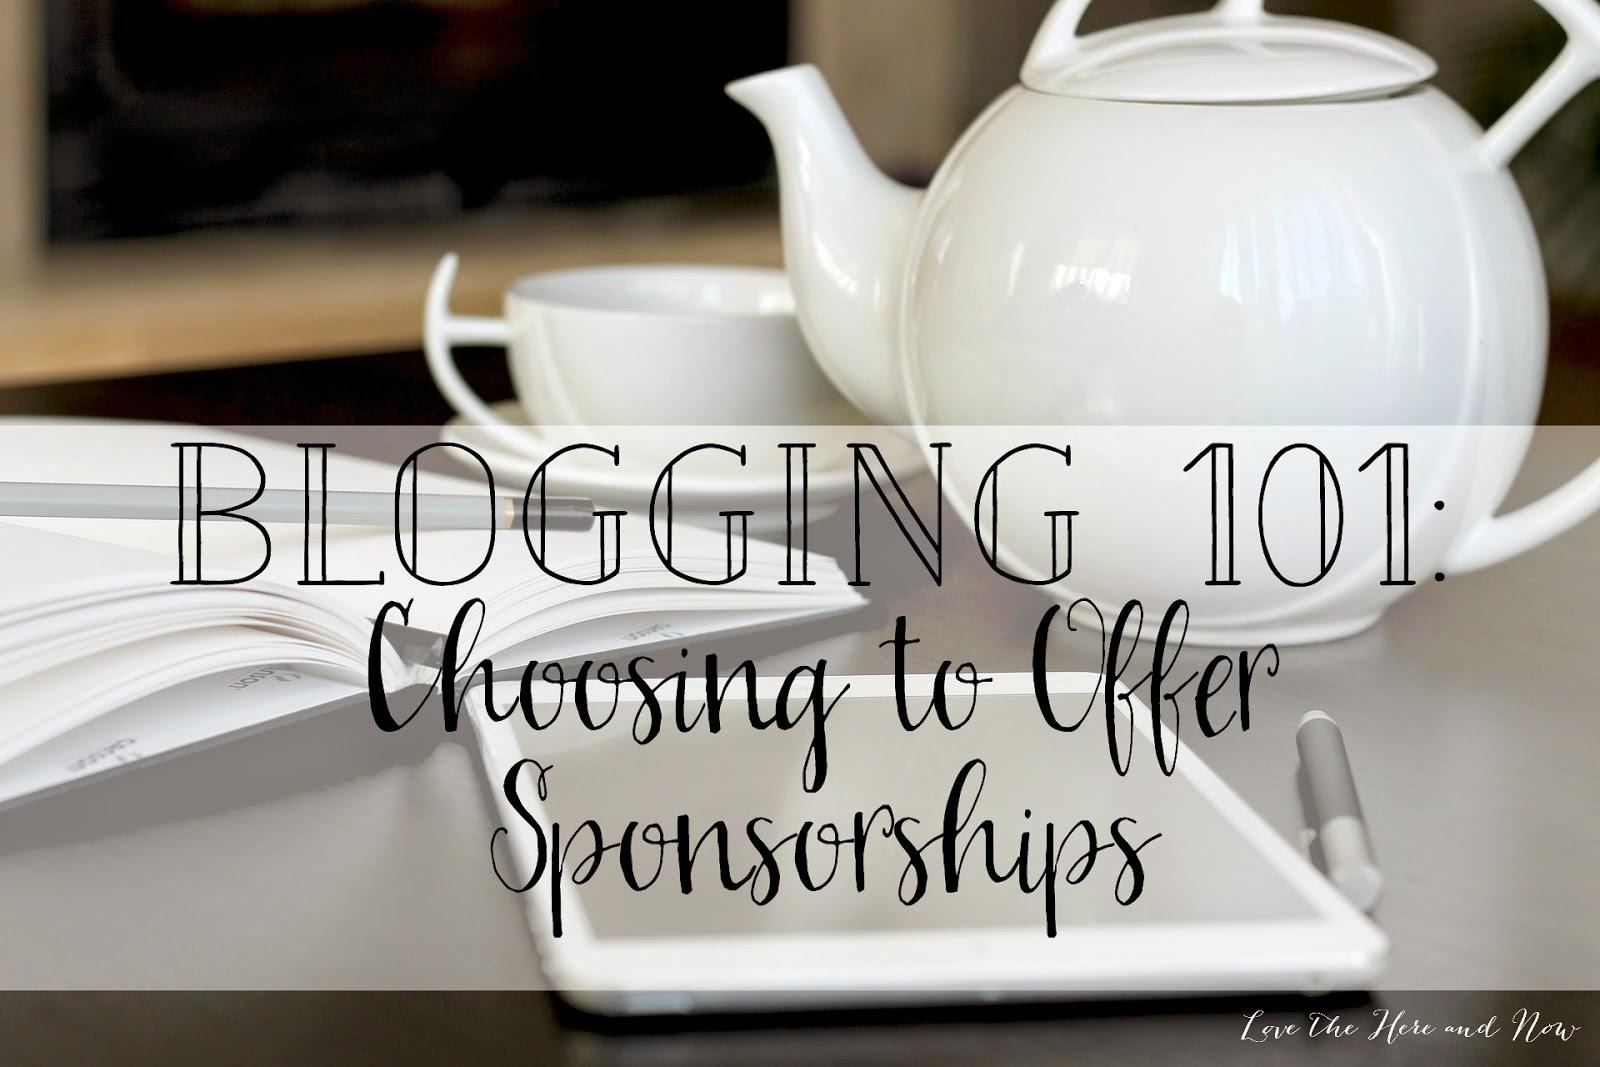 click for blog sponsorships